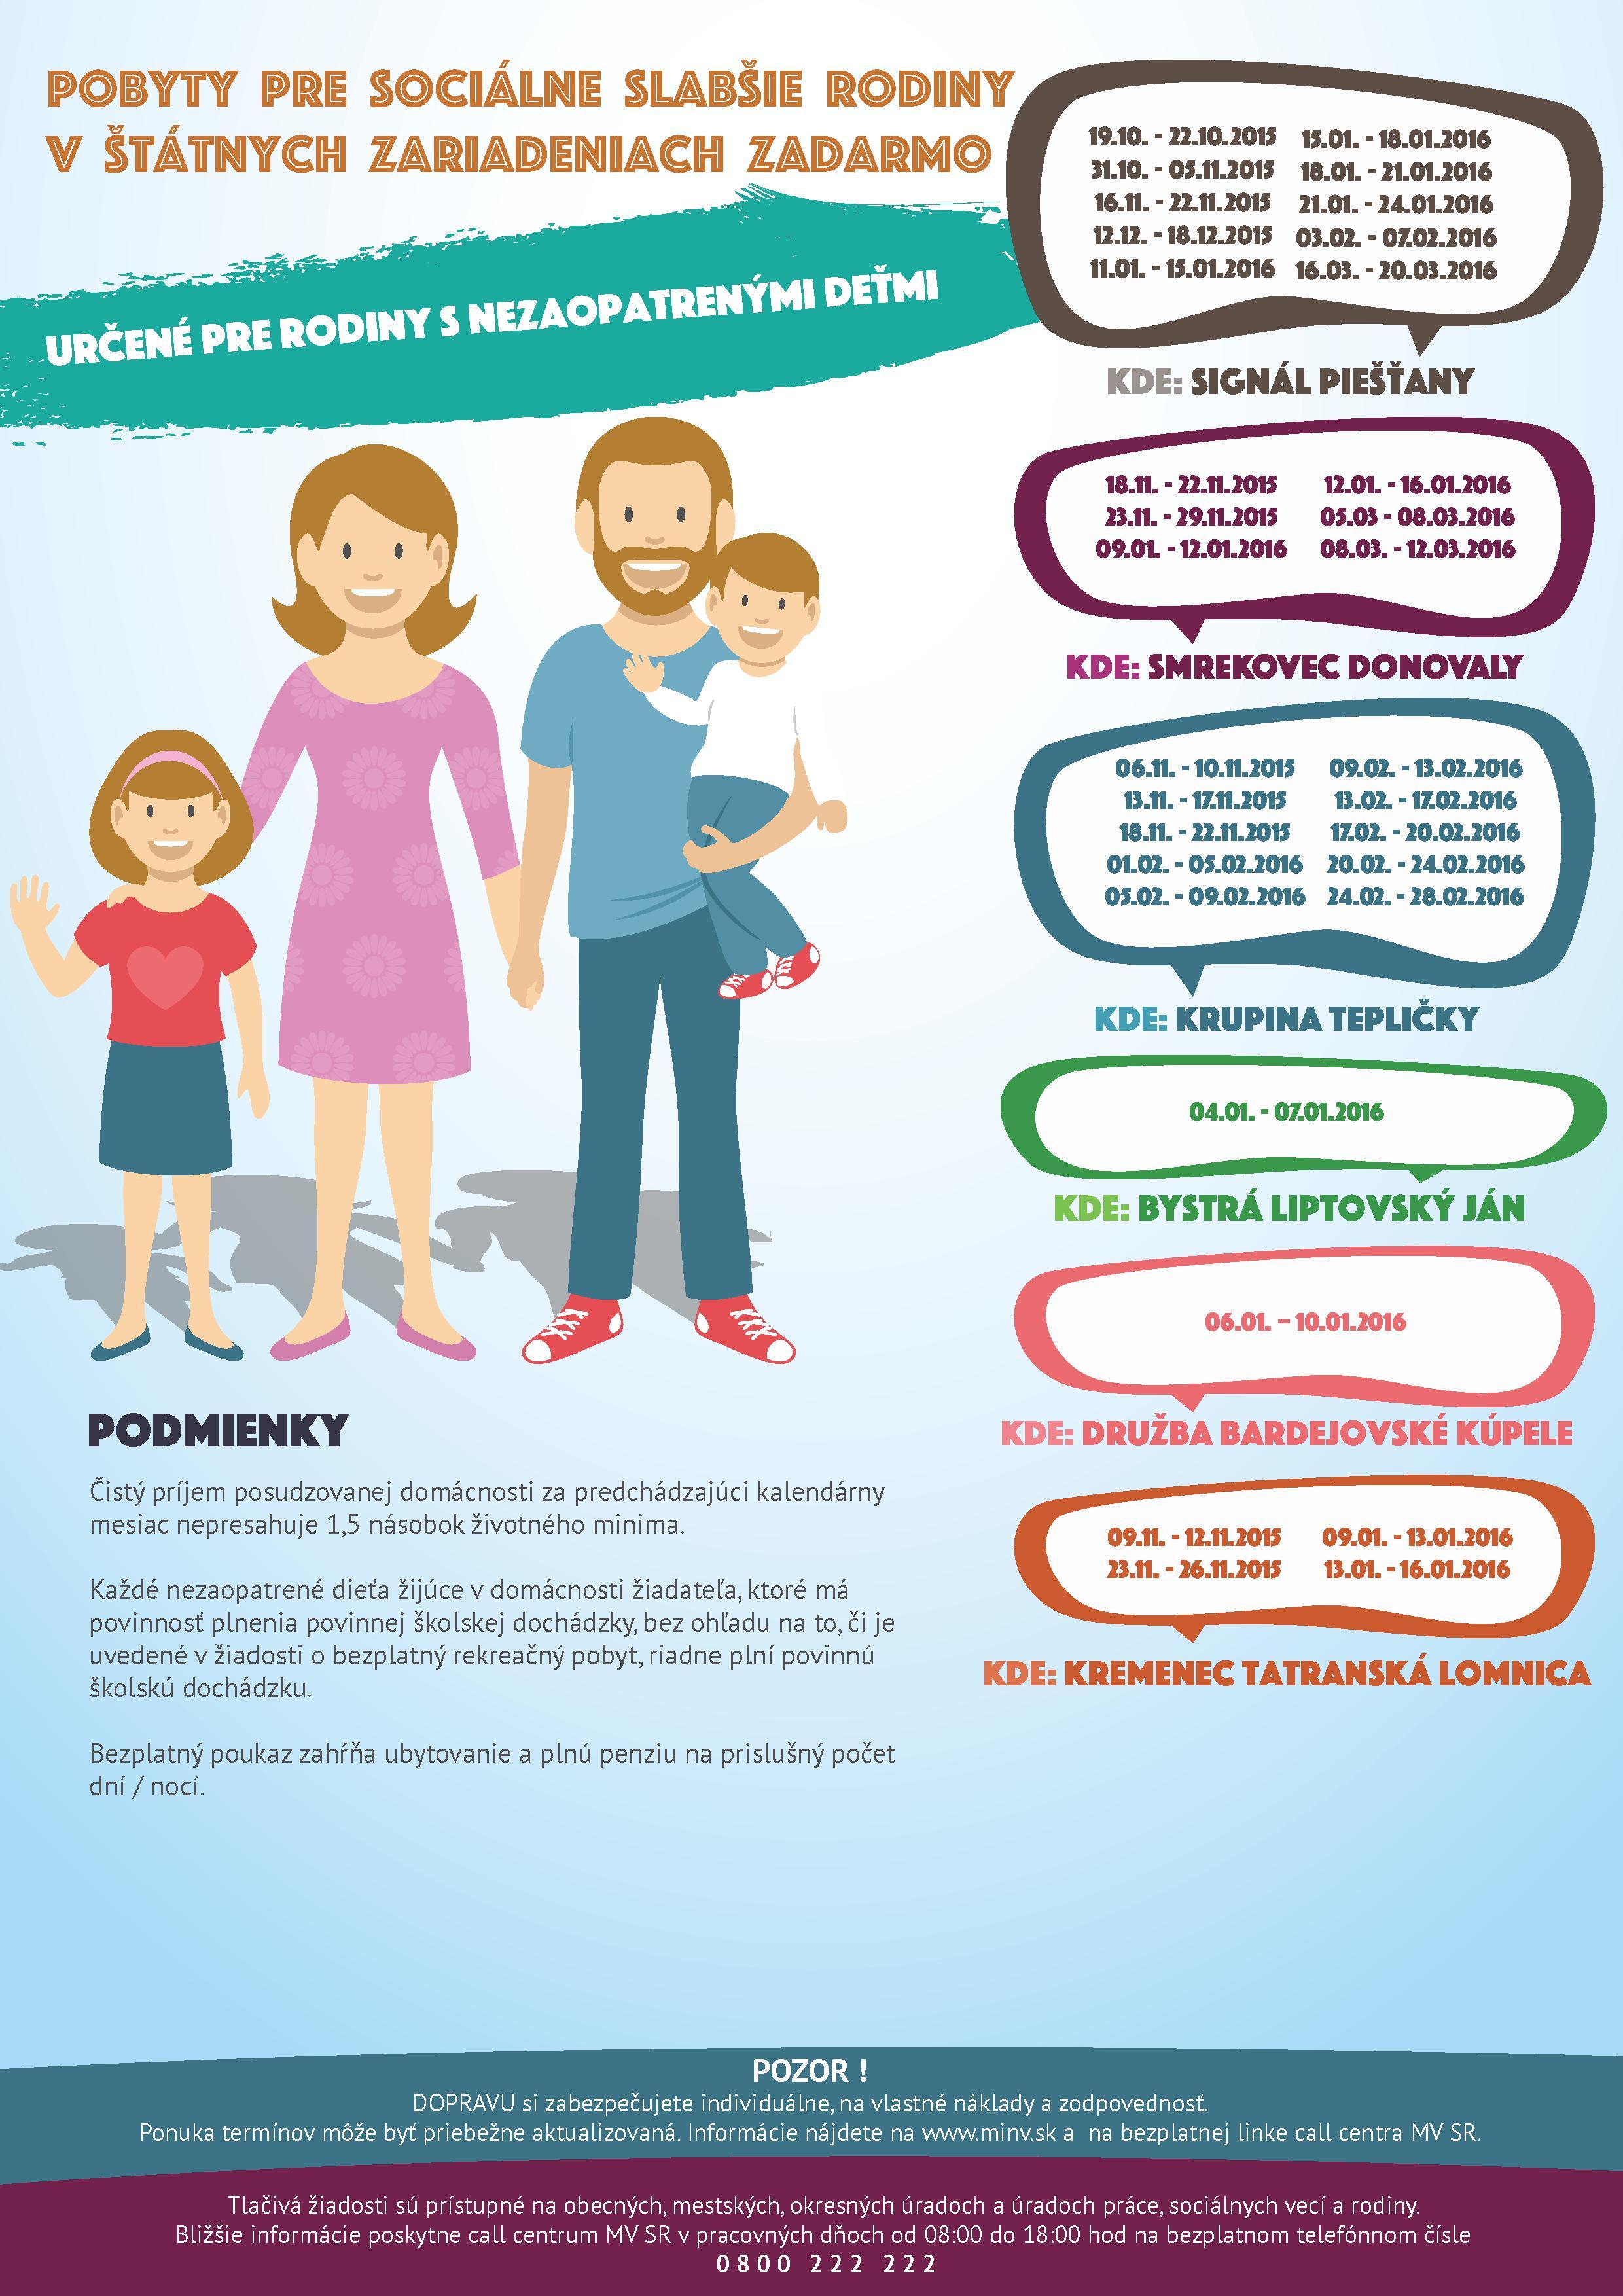 plagat-soc-rodiny-pobyty